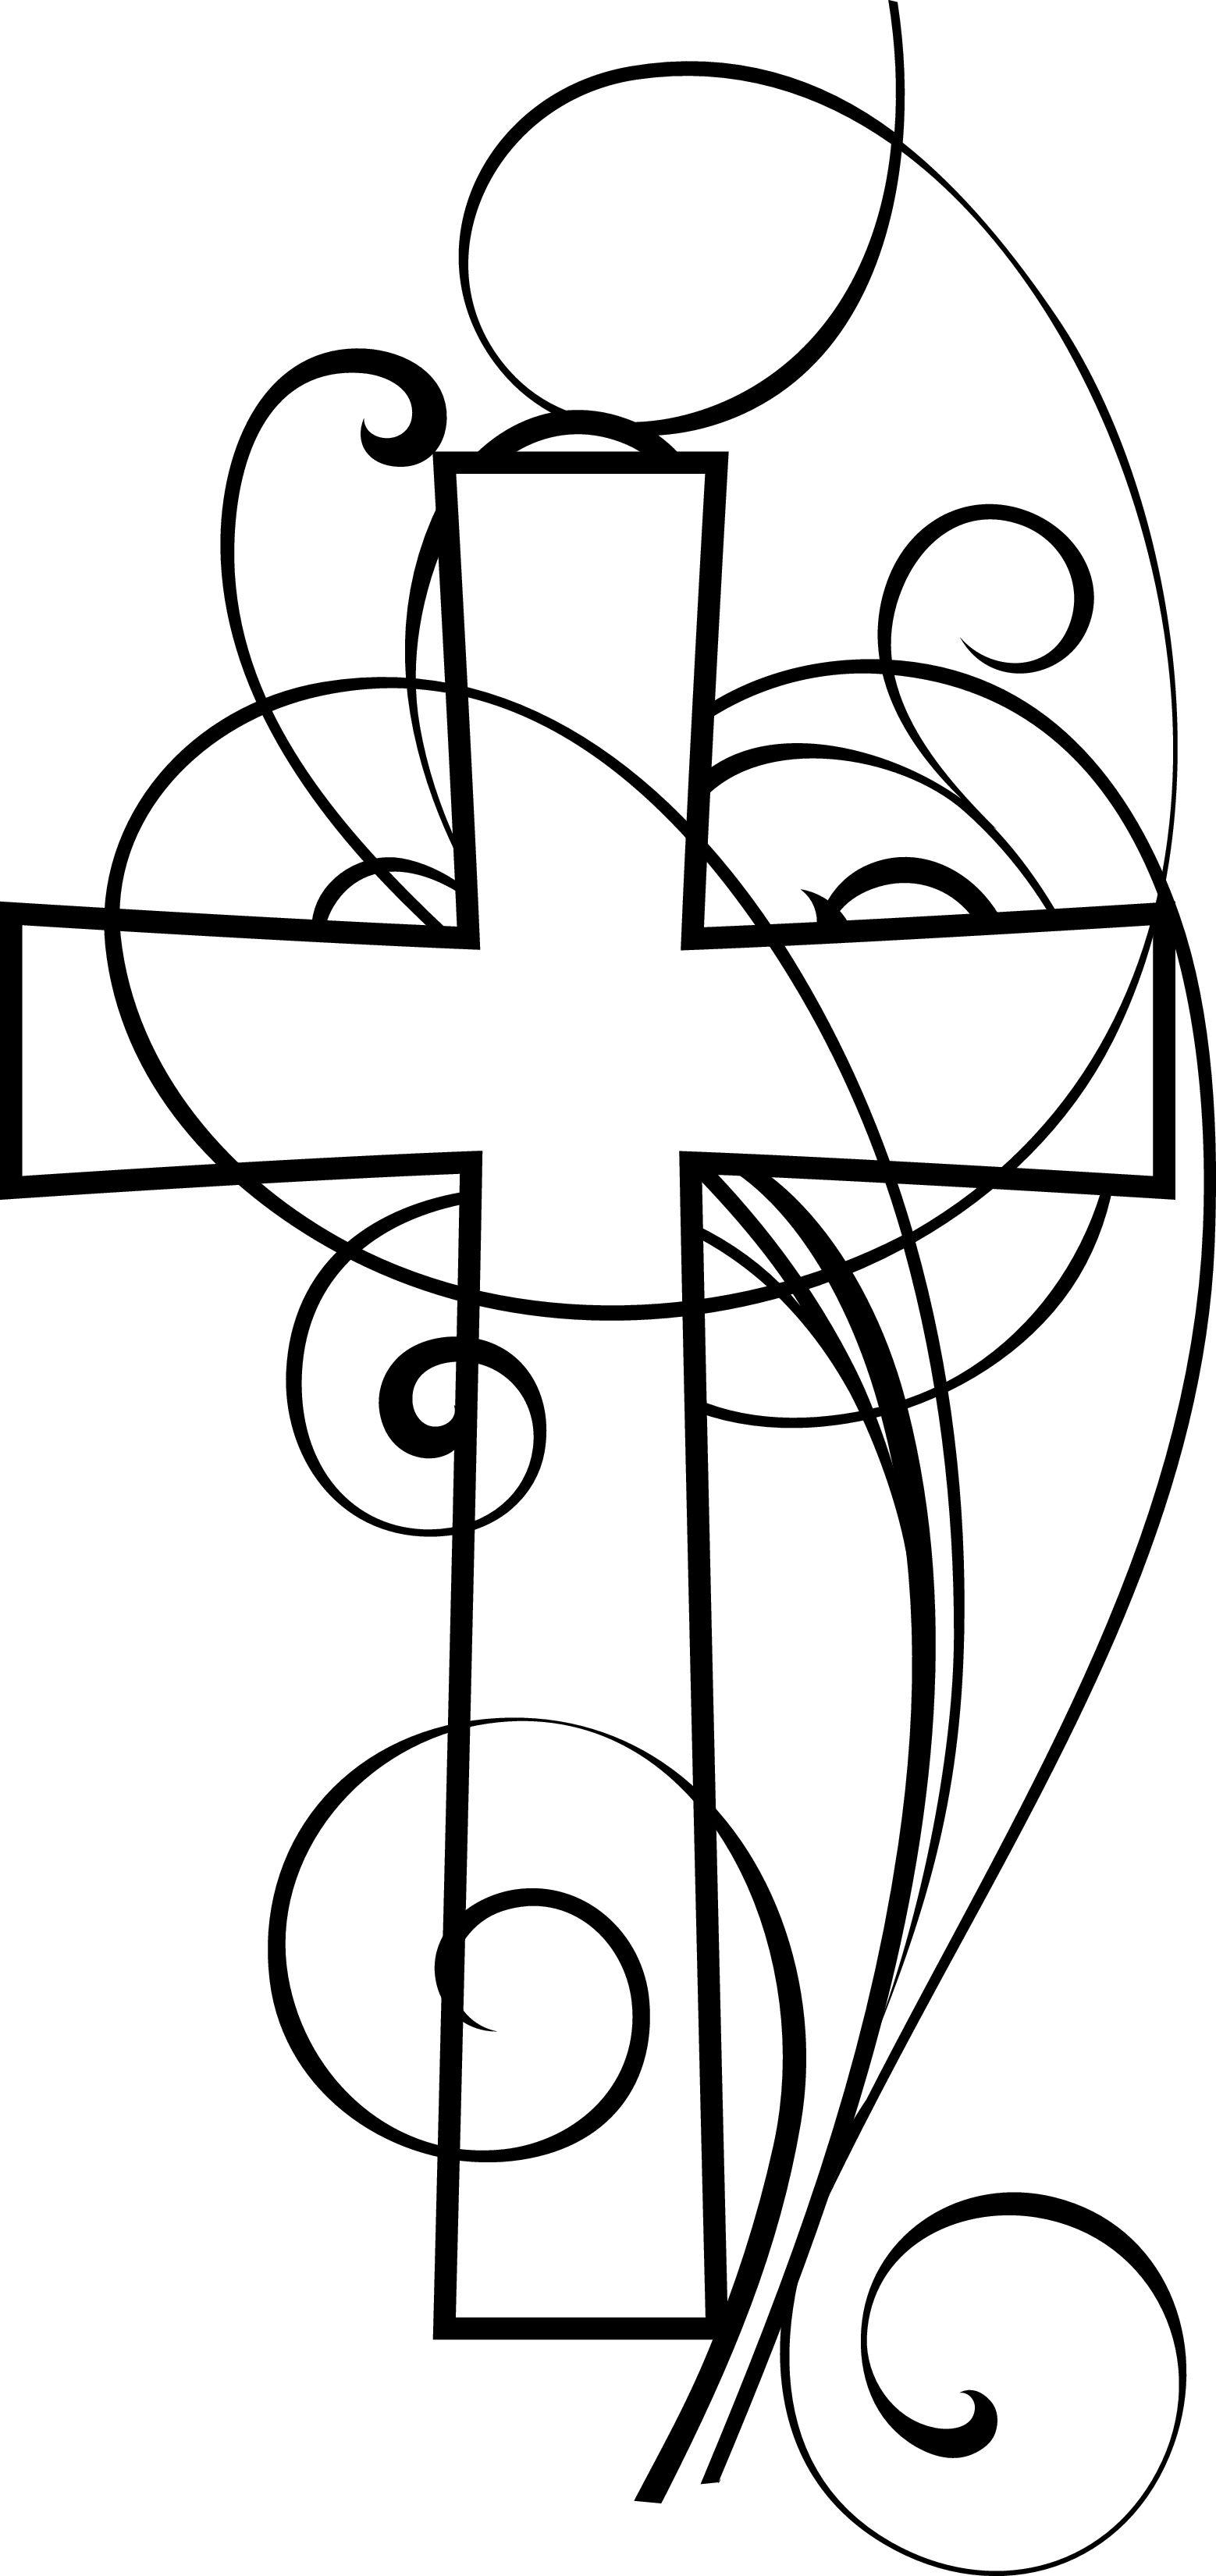 Baptism clipart swirl. Cross google search bible